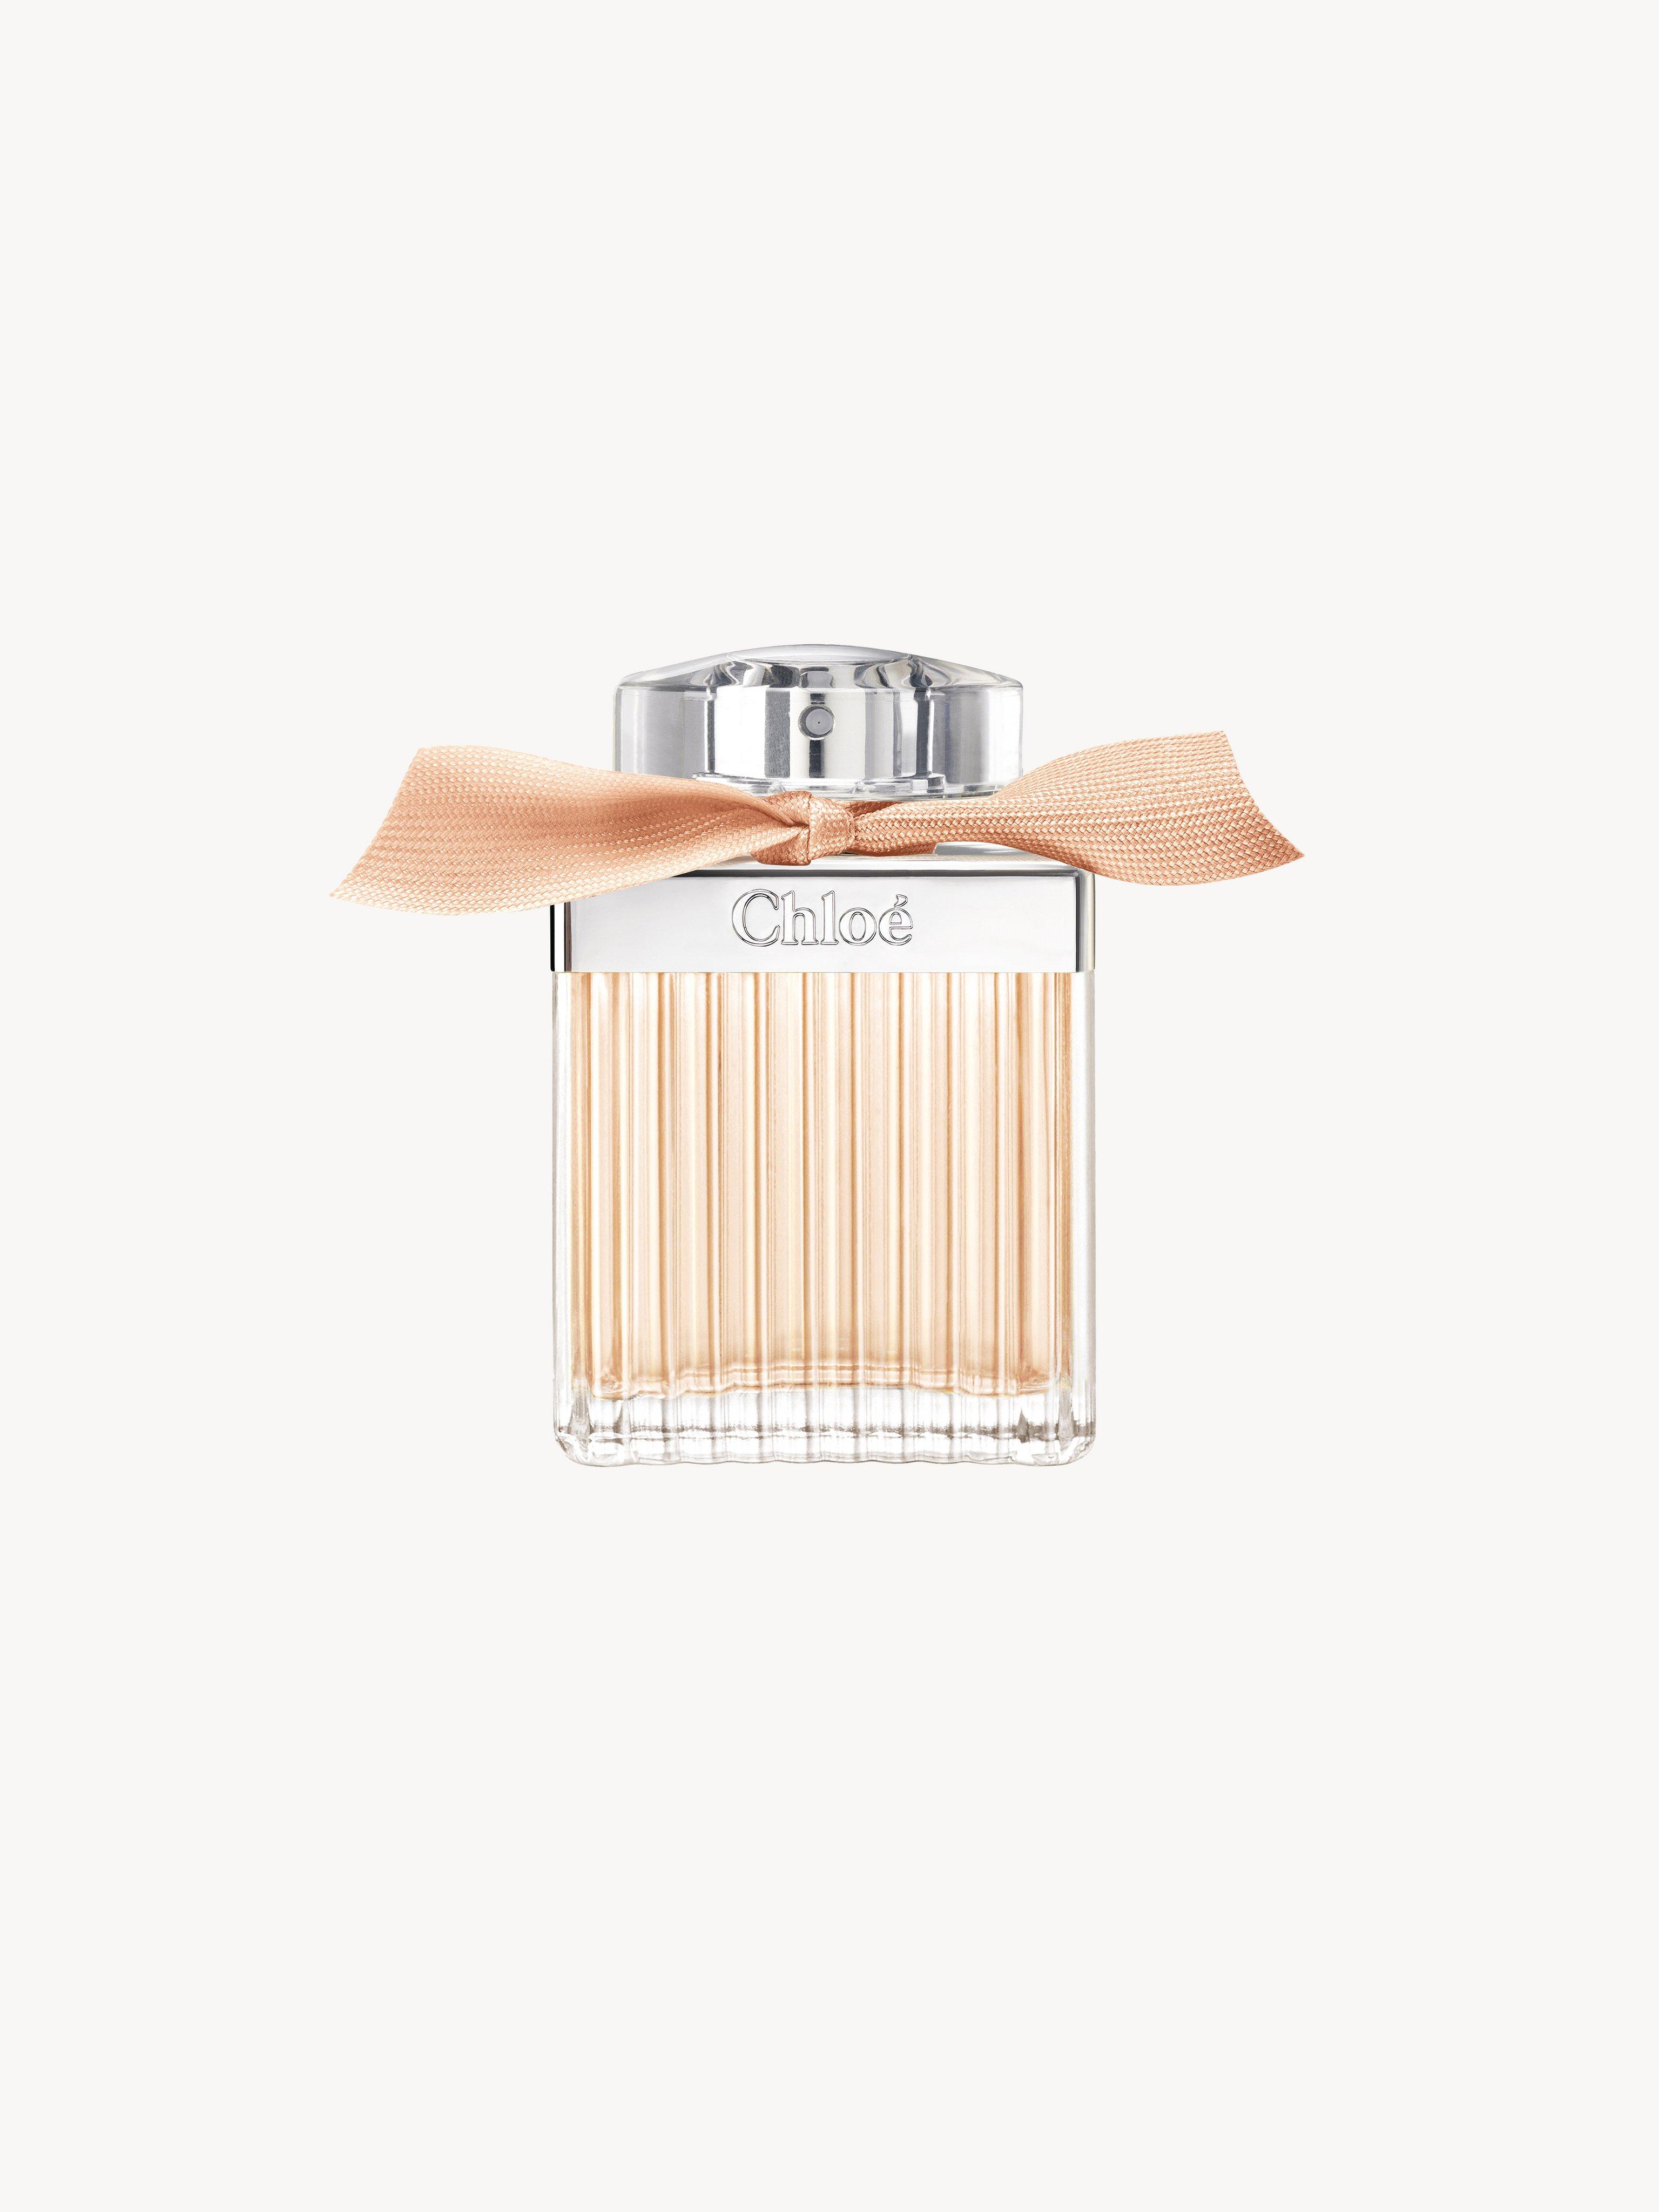 www.chloe.com - Chloé perfume - Rose Tangerine